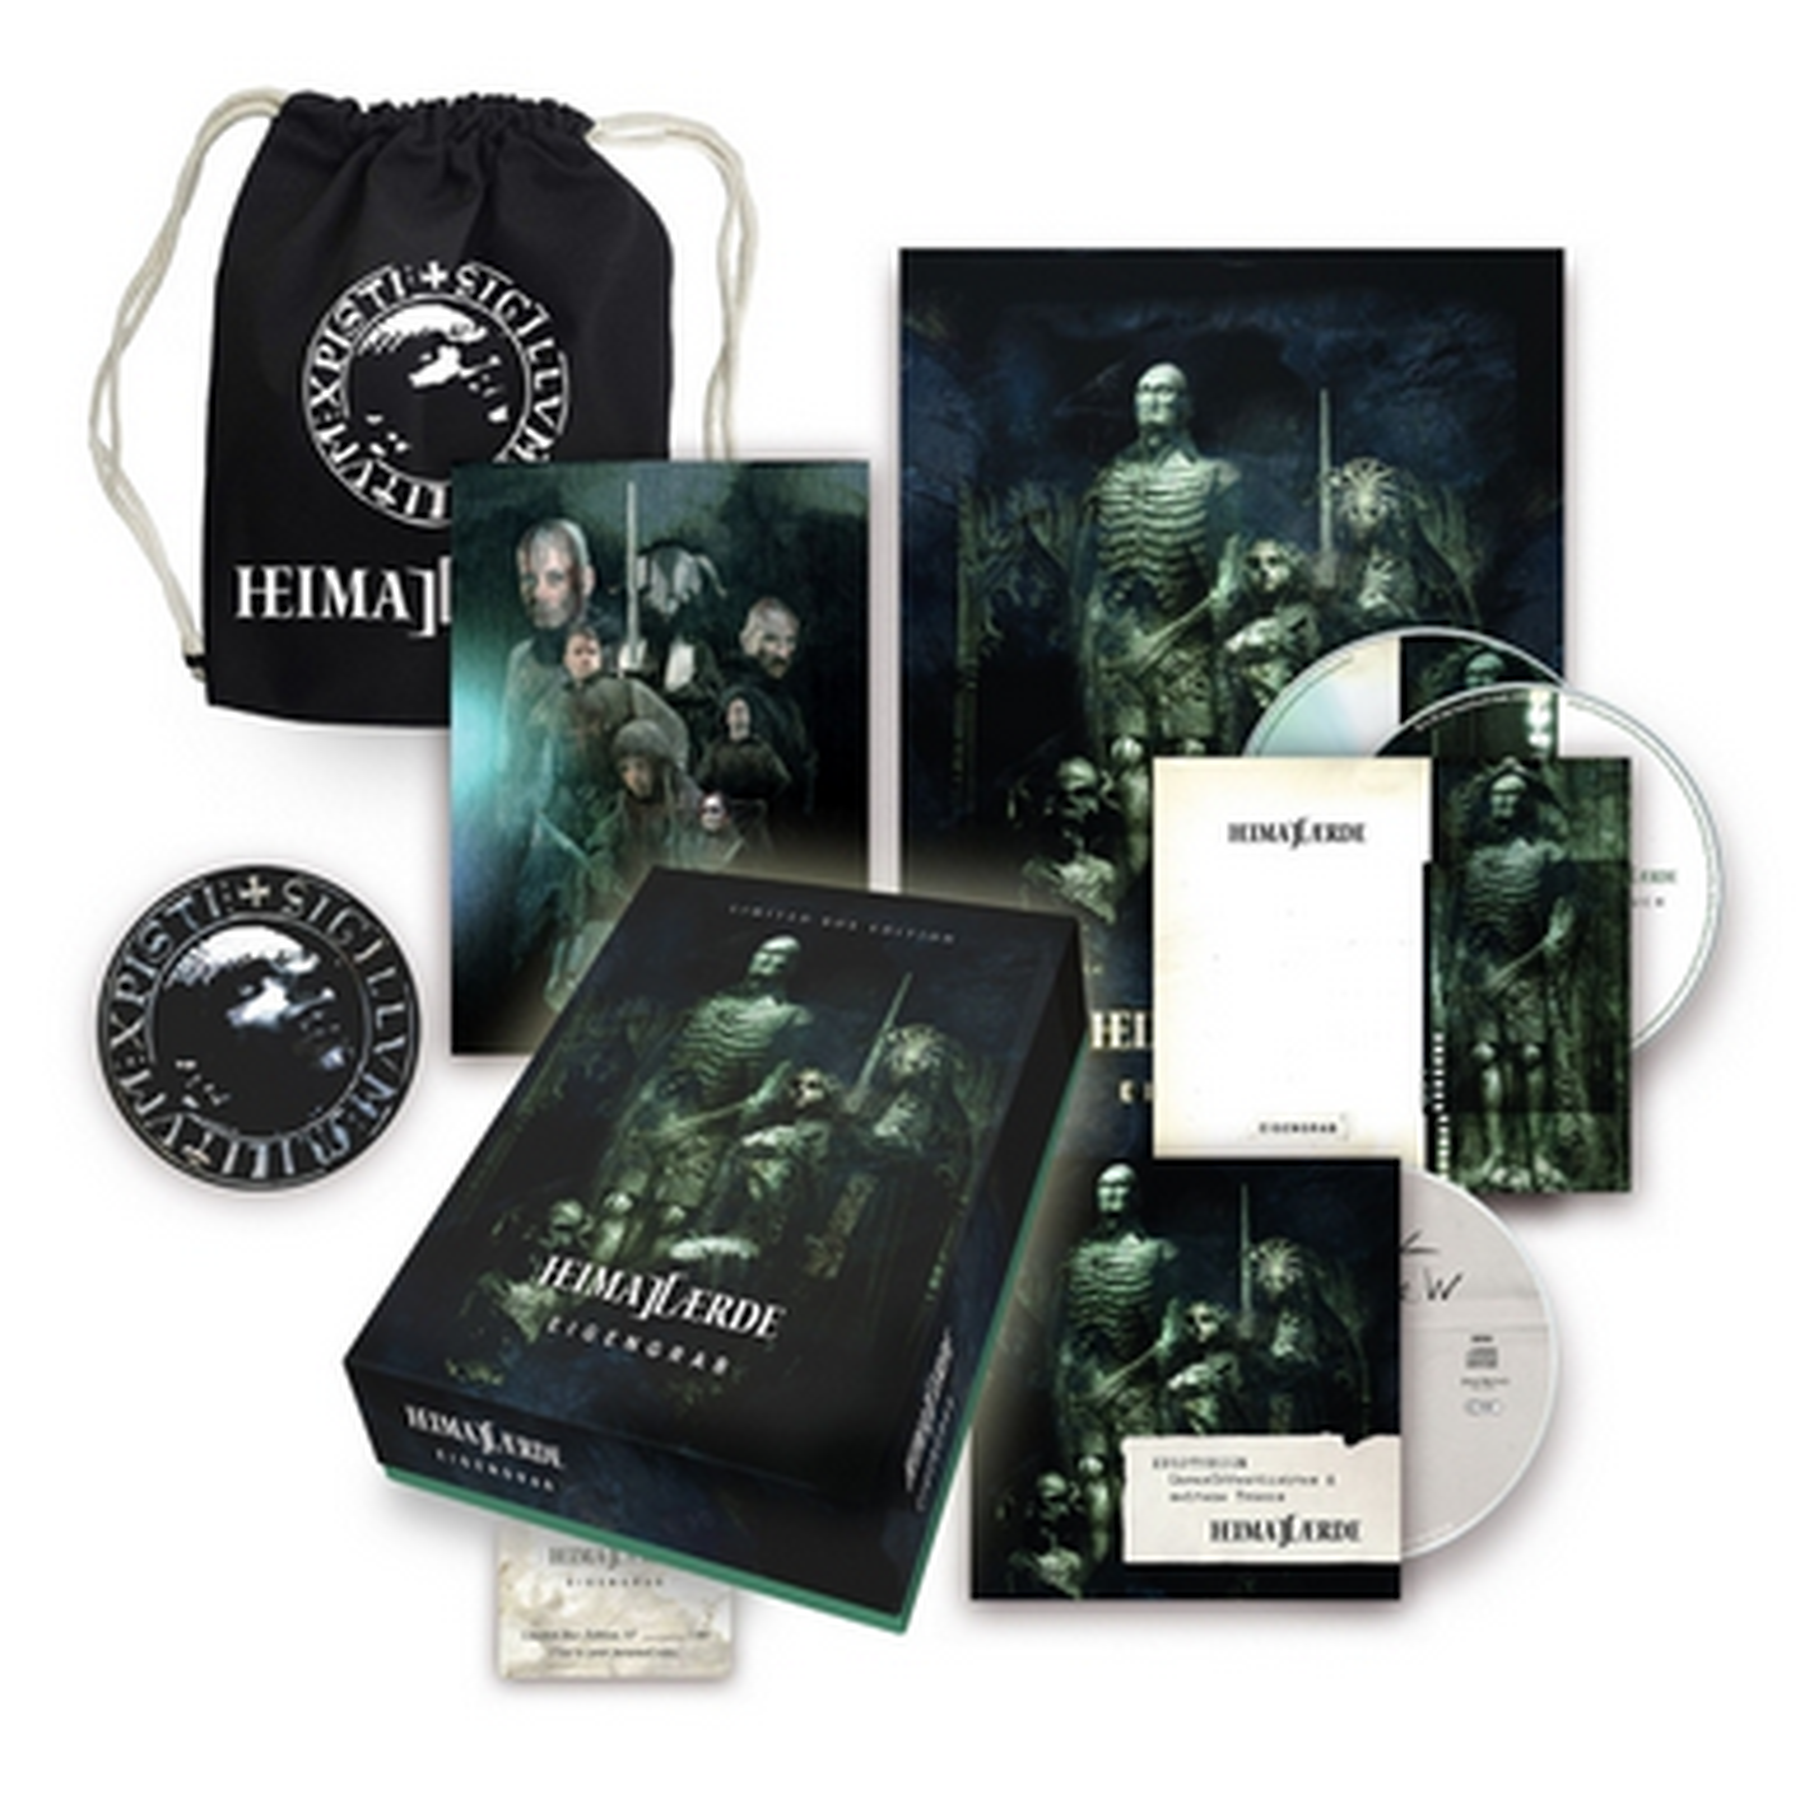 Heimataerde - Eigengrab (Limited Edition) - BOX